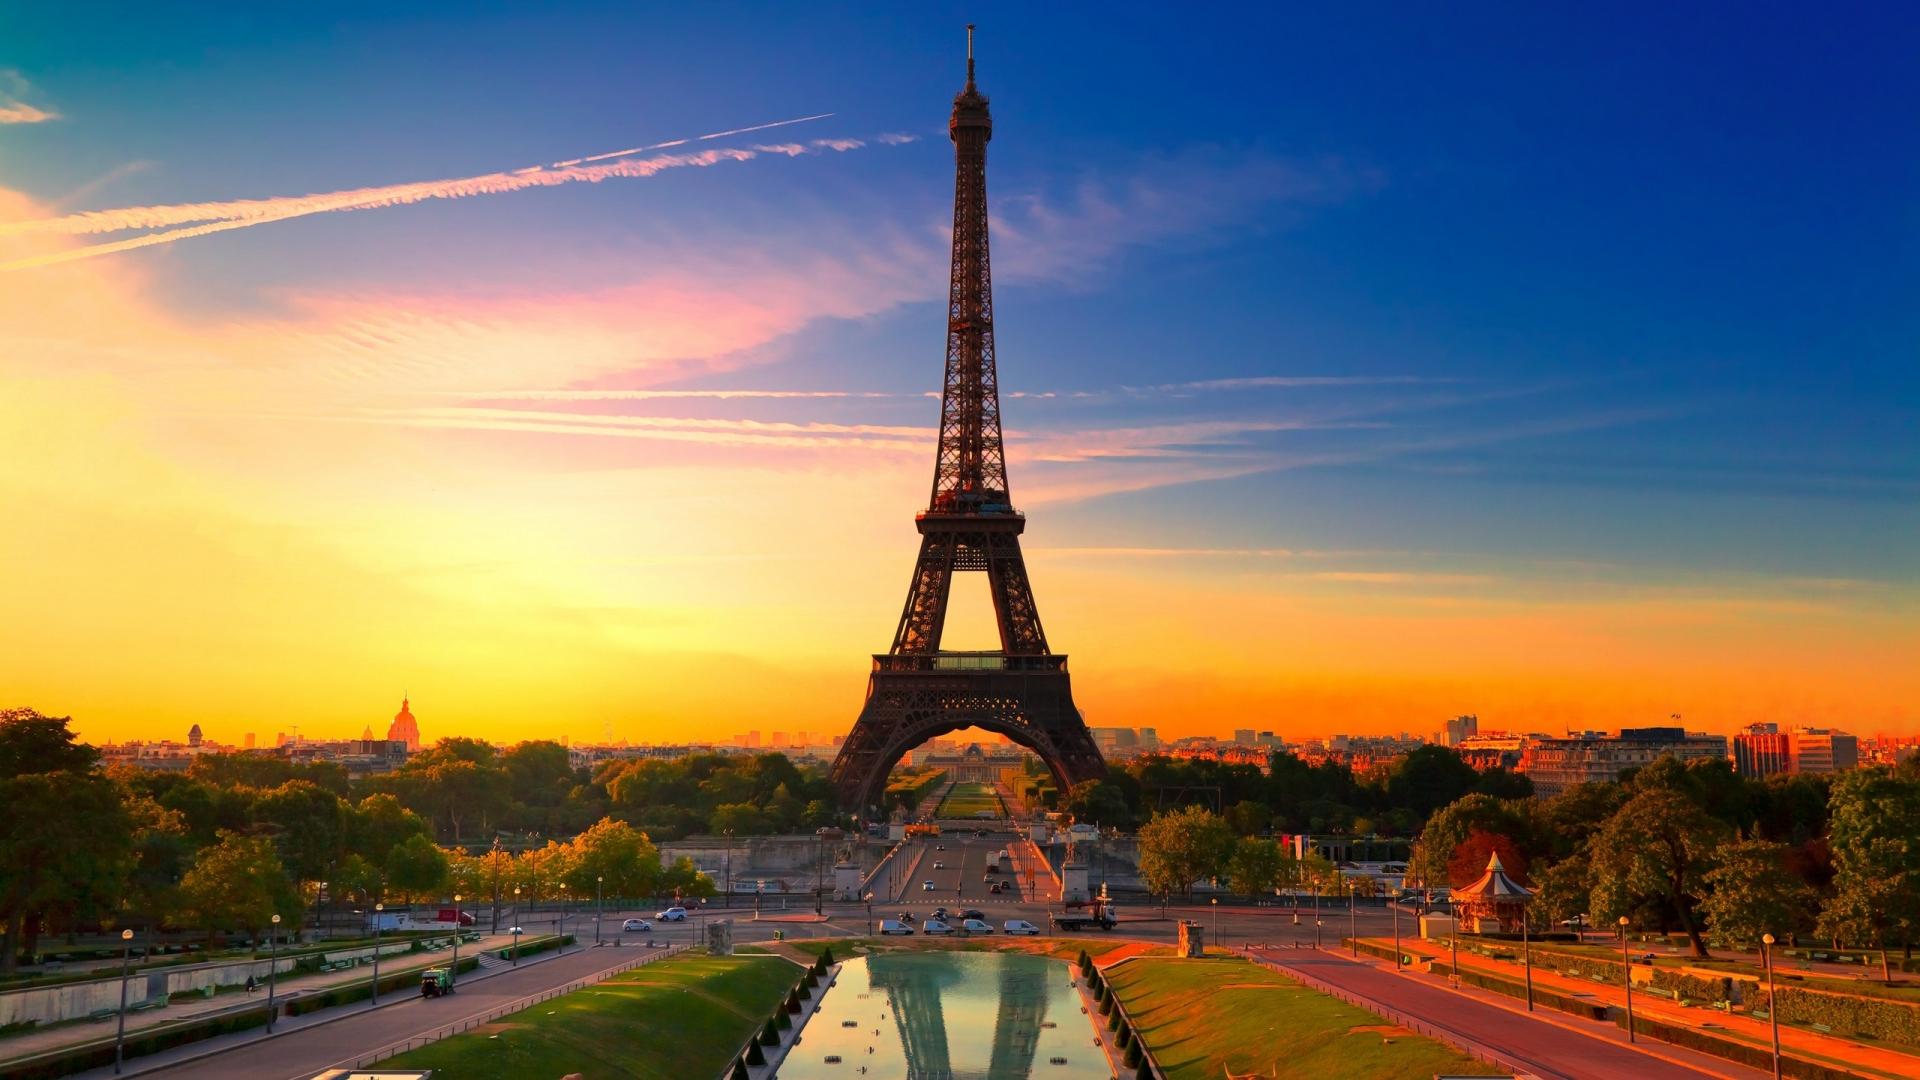 30 Paris Wallpapers The Romance Beneath The City Lights 1920x1080